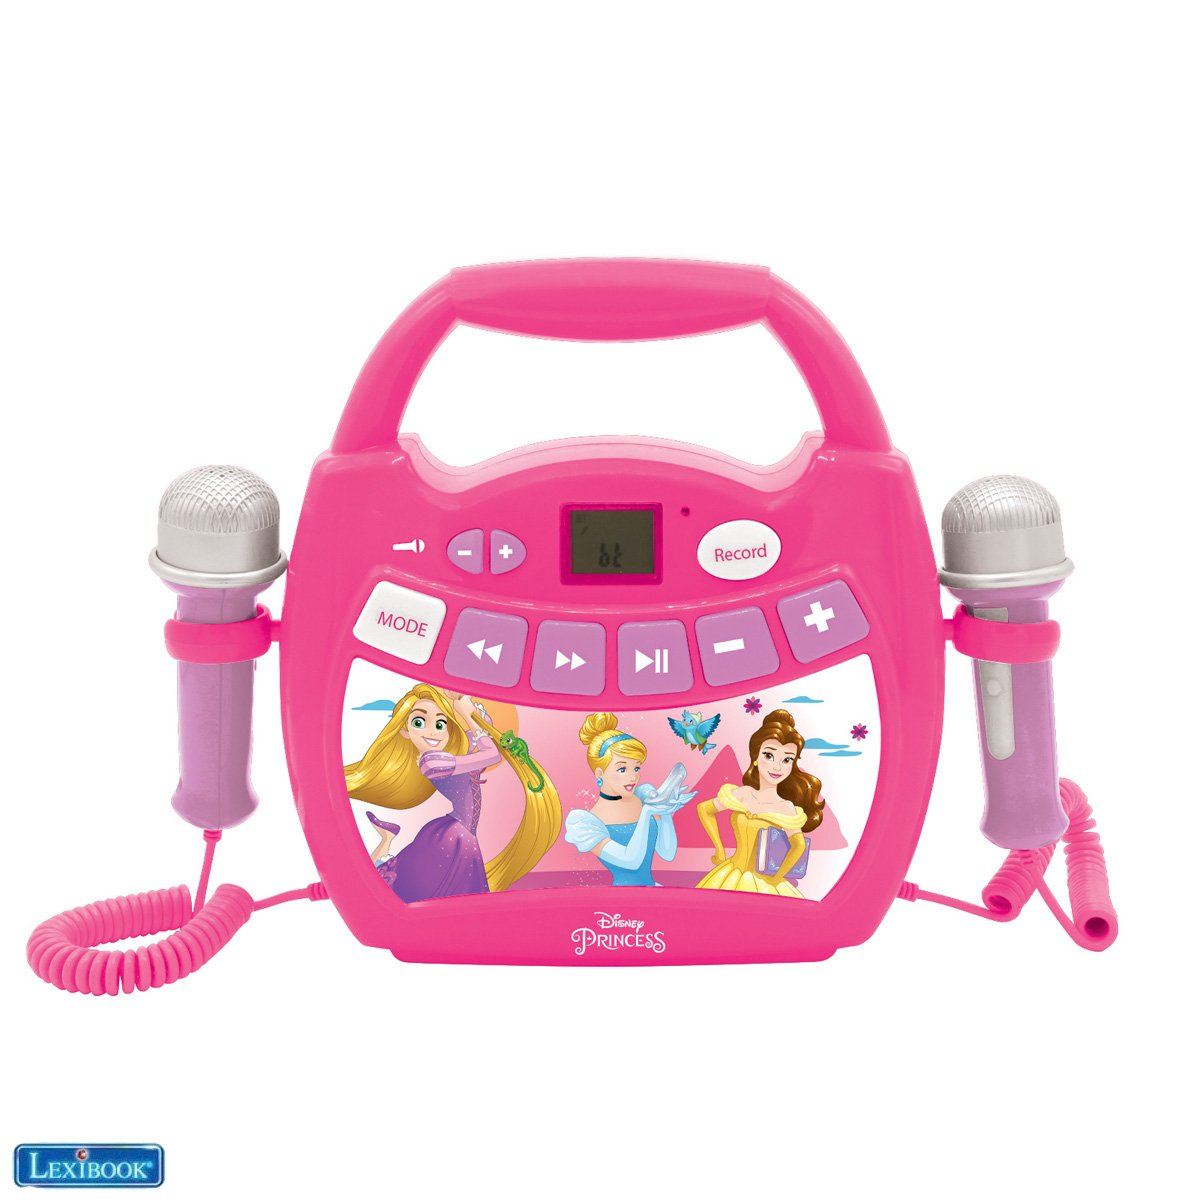 Lexibook - Disney Princesses Portable Digital Music Player with 2 Mics (MP300DPZ)